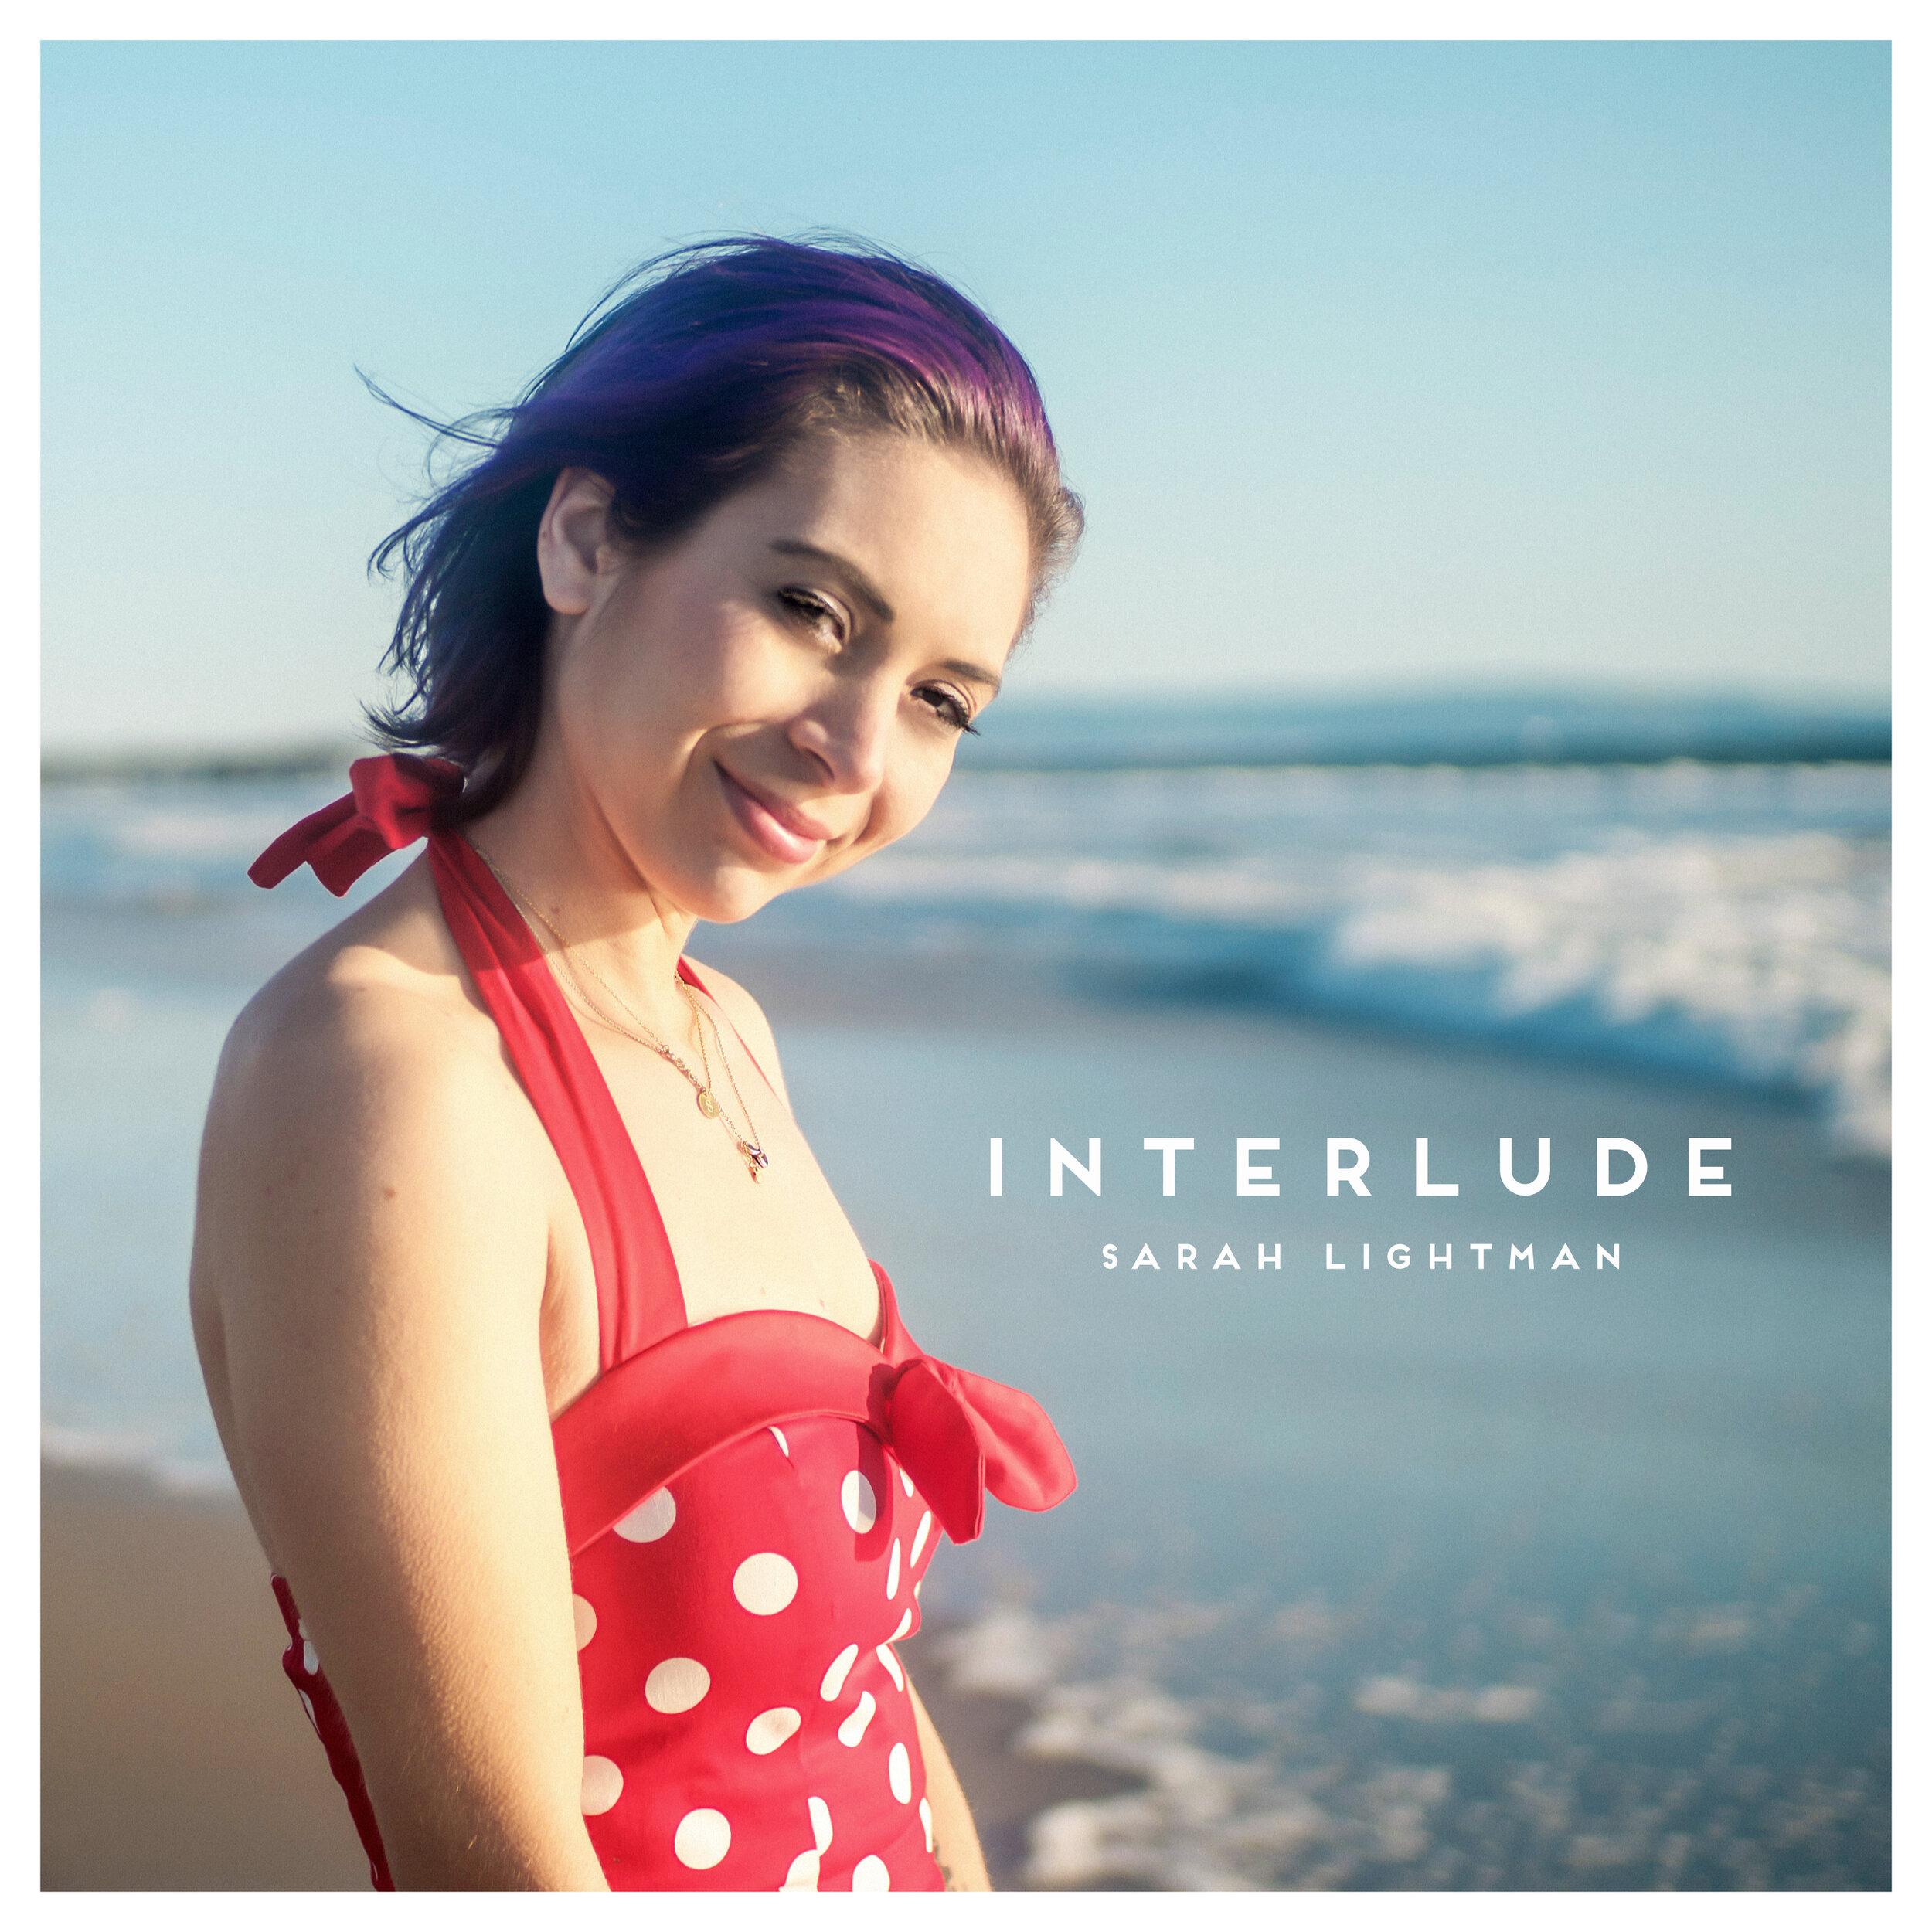 Interlude Album Cover